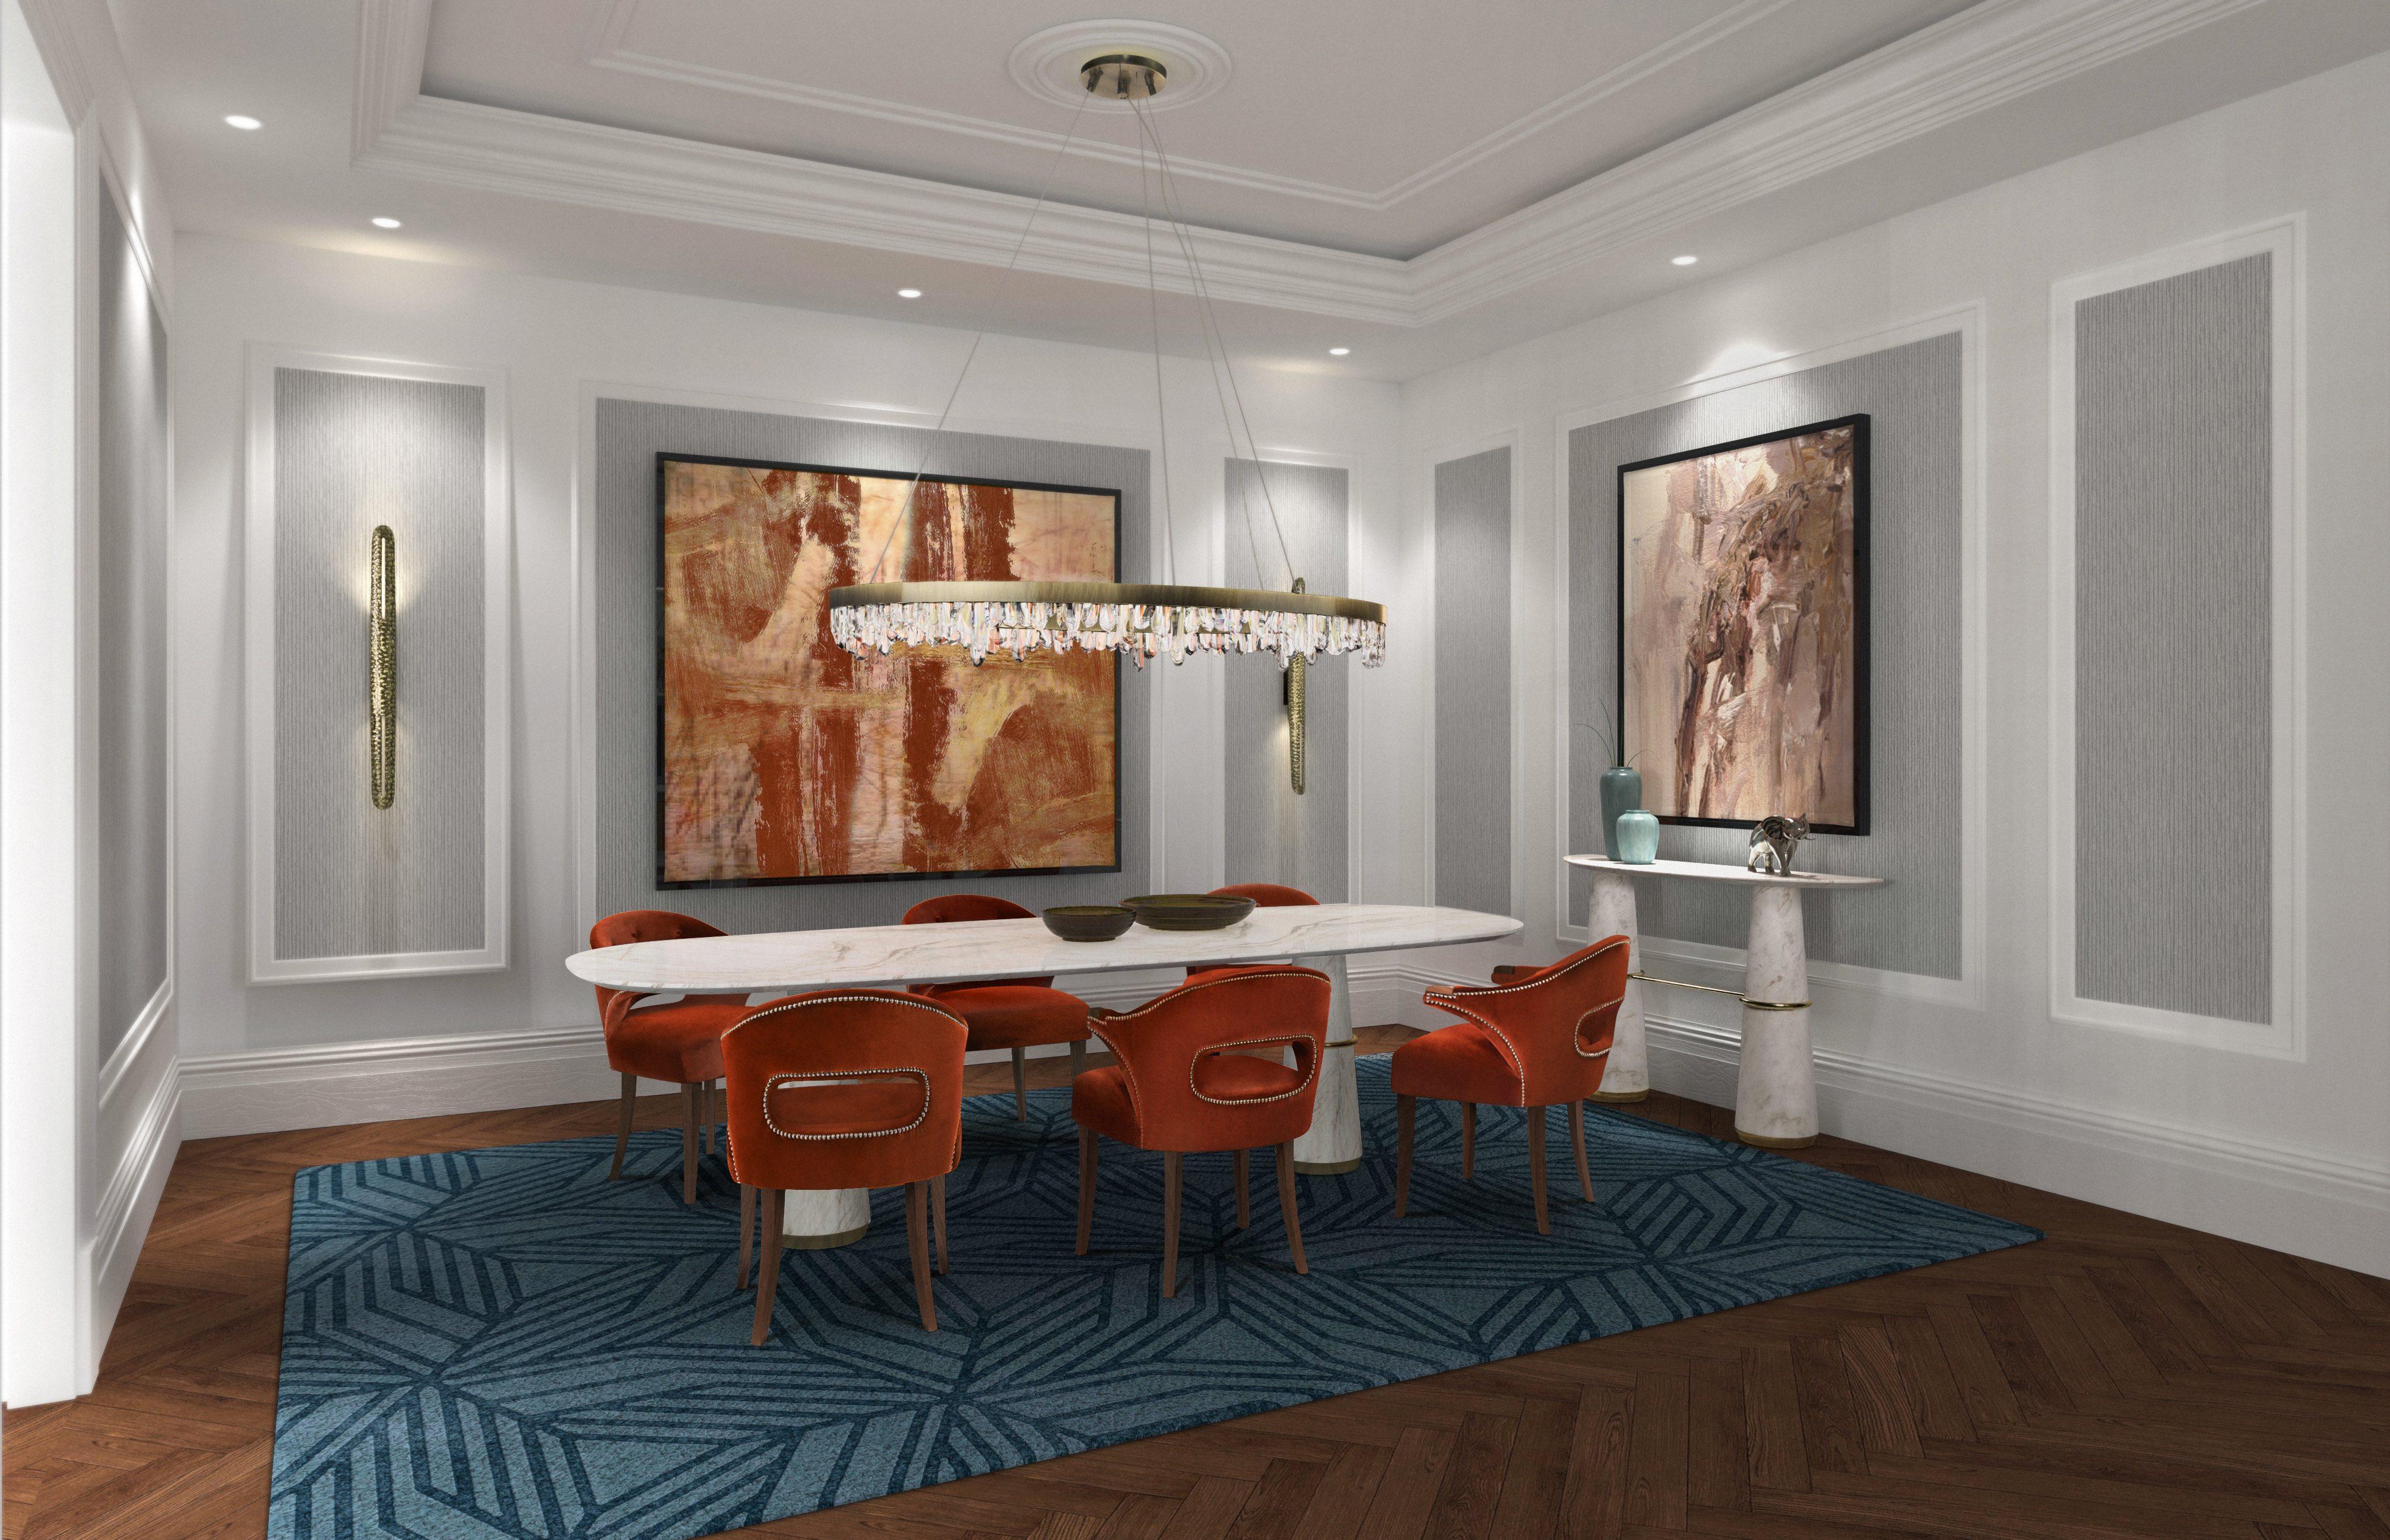 Geometric Rugs - The Power of 20th-century Avant-Garde Expression geometric rugs Geometric Rugs – The Power of 20th-century Avant-Garde Expression geometric rugs kaiwa